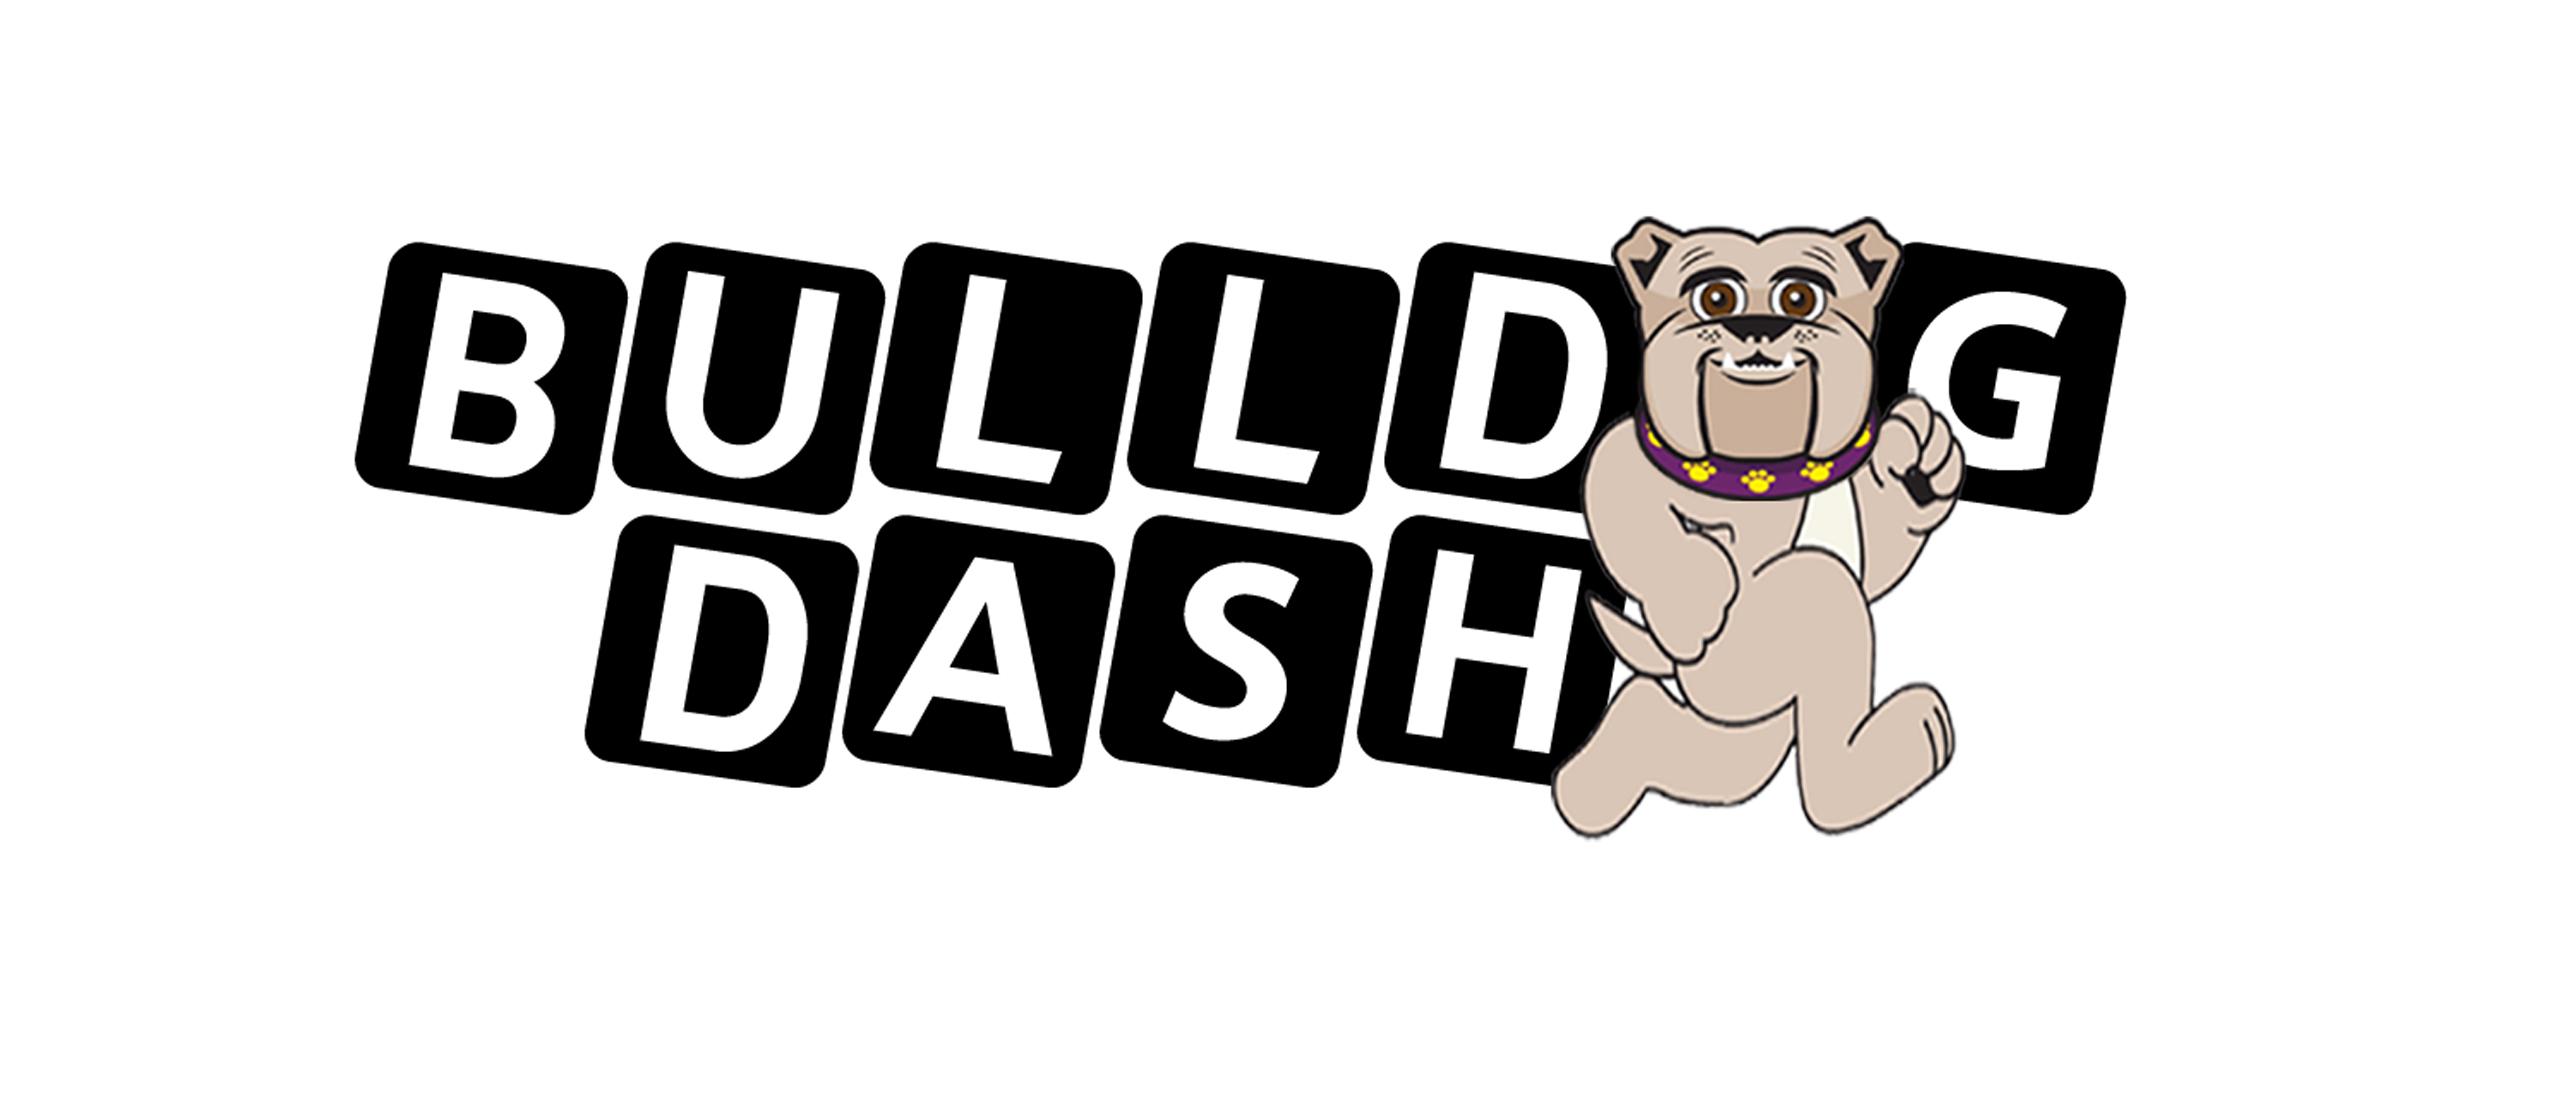 Bulldog Dash